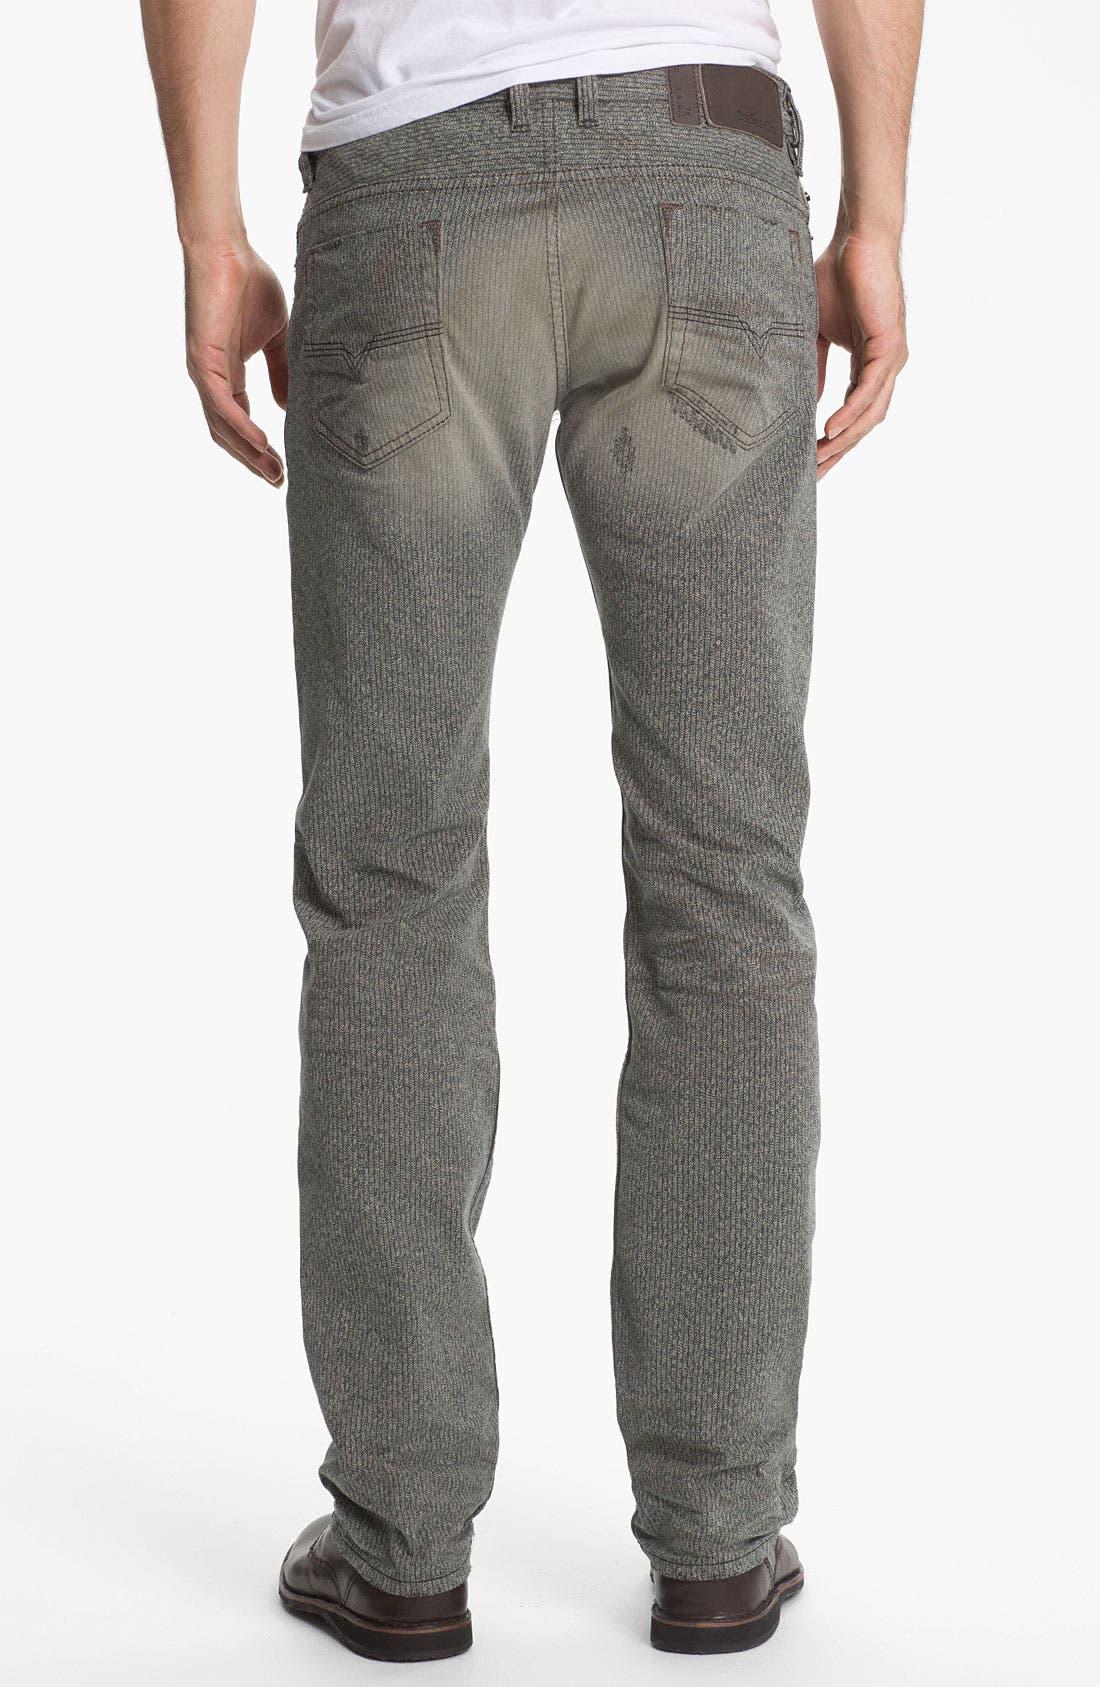 Alternate Image 1 Selected - DIESEL® 'Safado' Straight Leg Jeans (0807M)